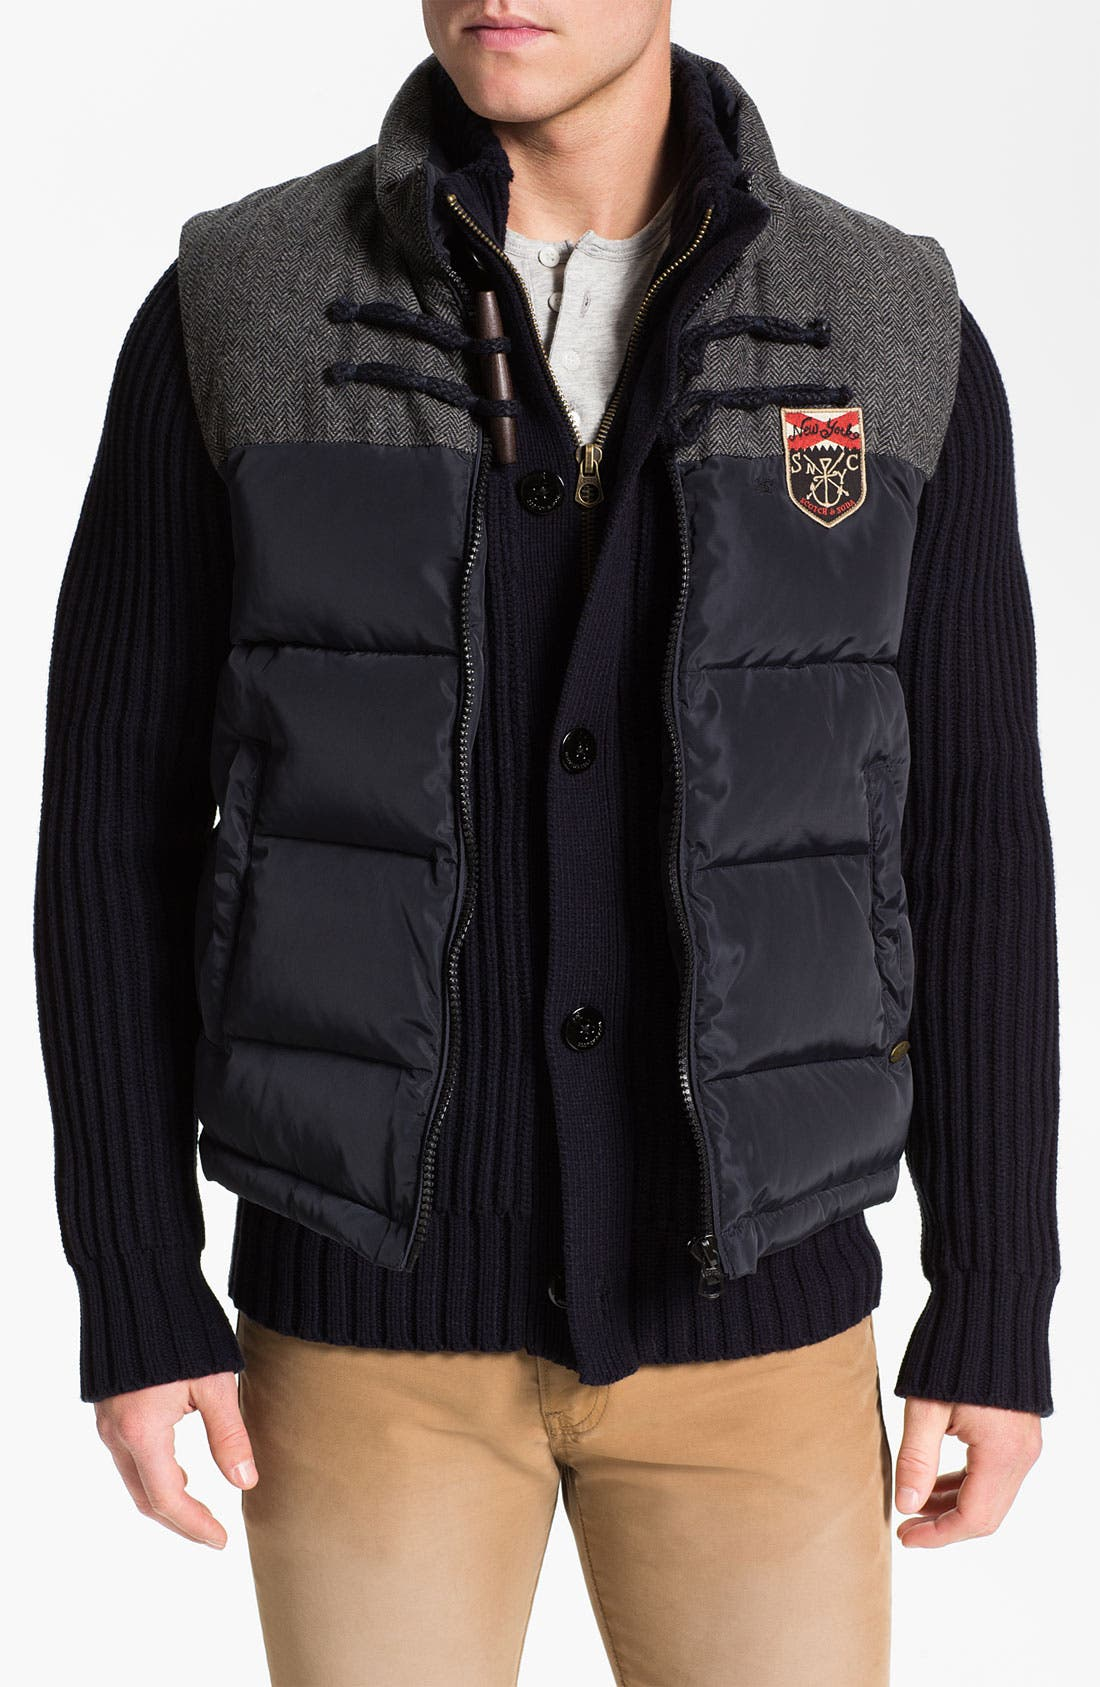 Main Image - Scotch & Soda Sweater & Vest Combo